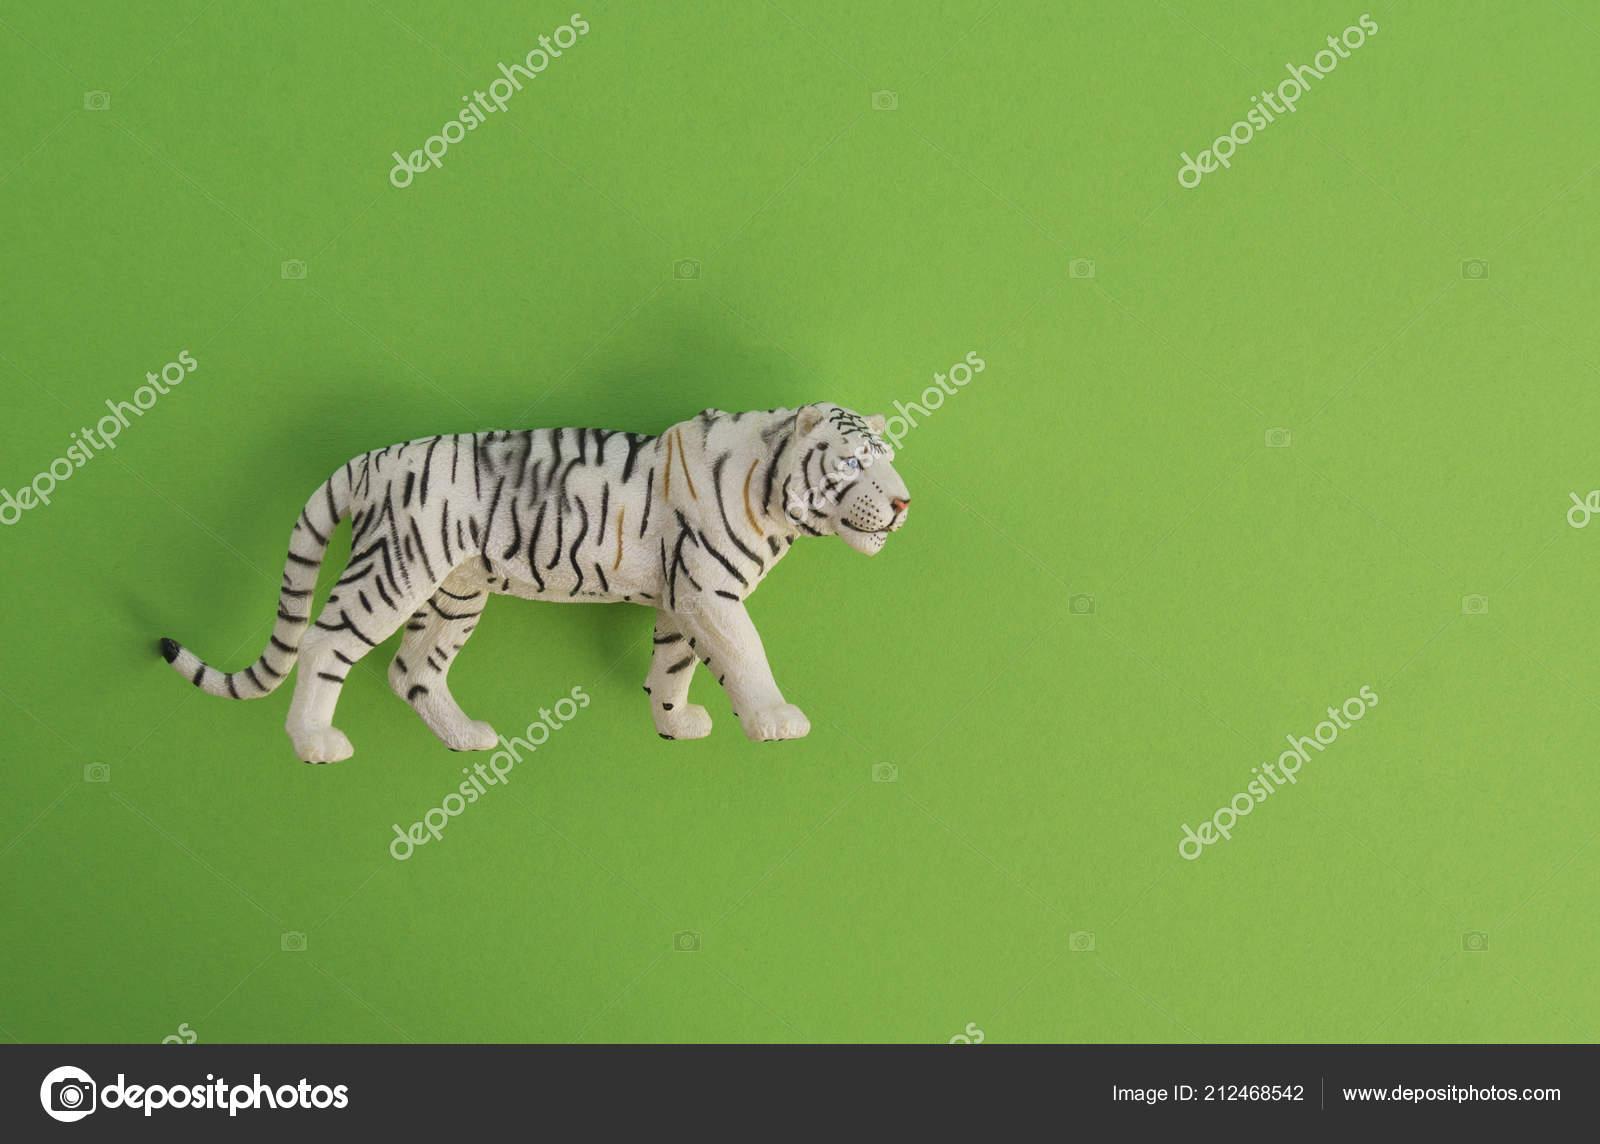 Animal Plástico Fondo Figurita Para Juguete Juego Tigre Niños OuXkPZi